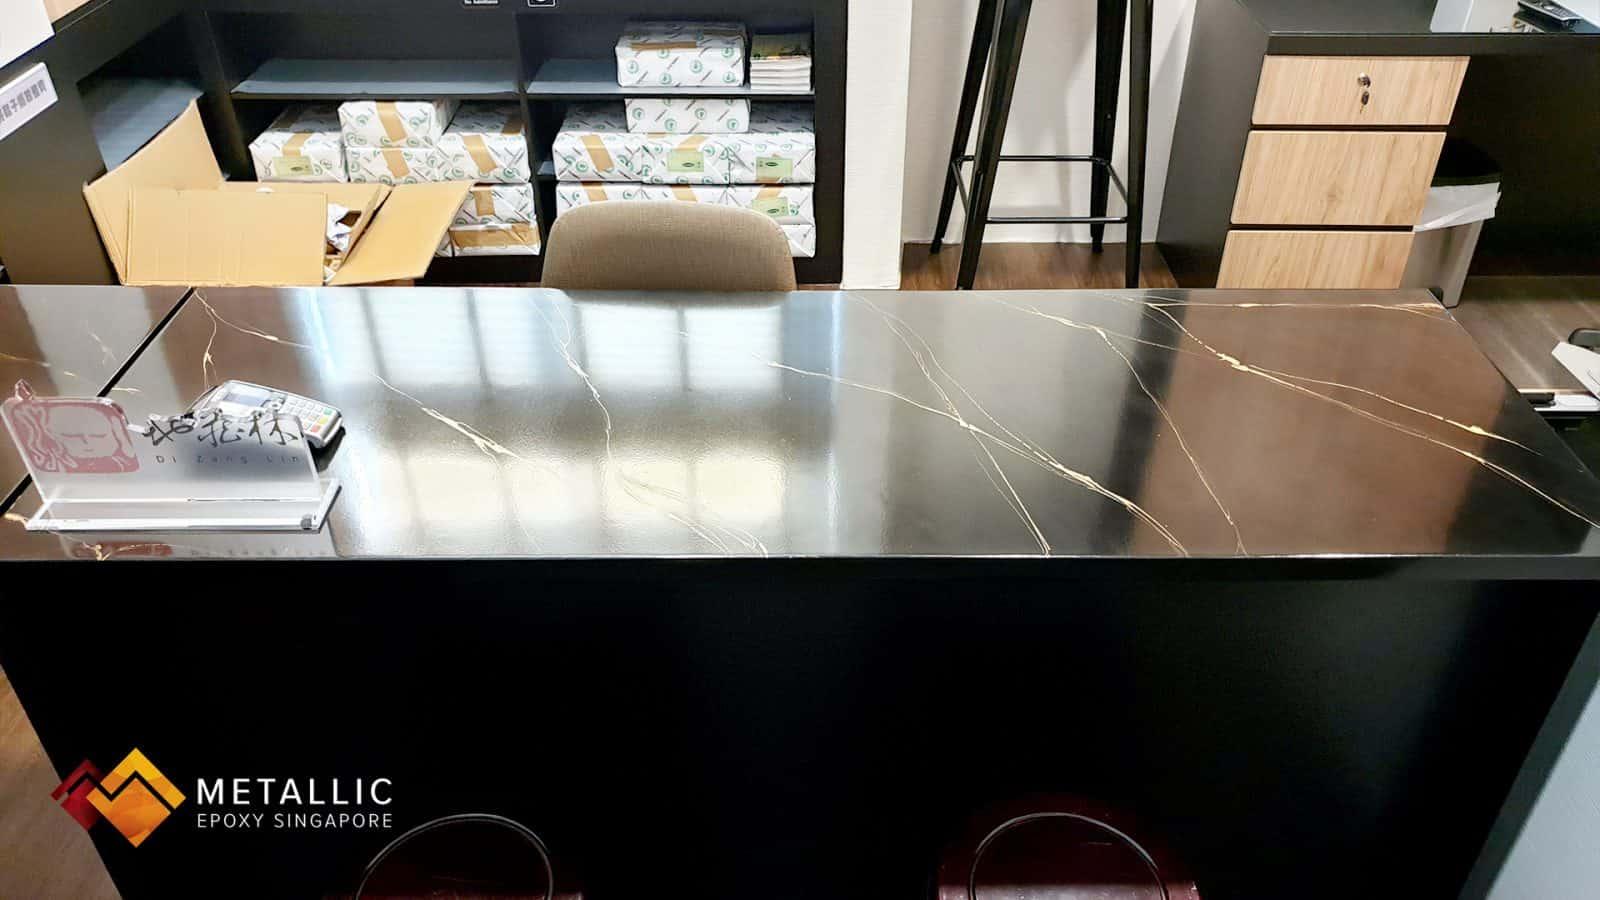 Metallic Epoxy Tabletop